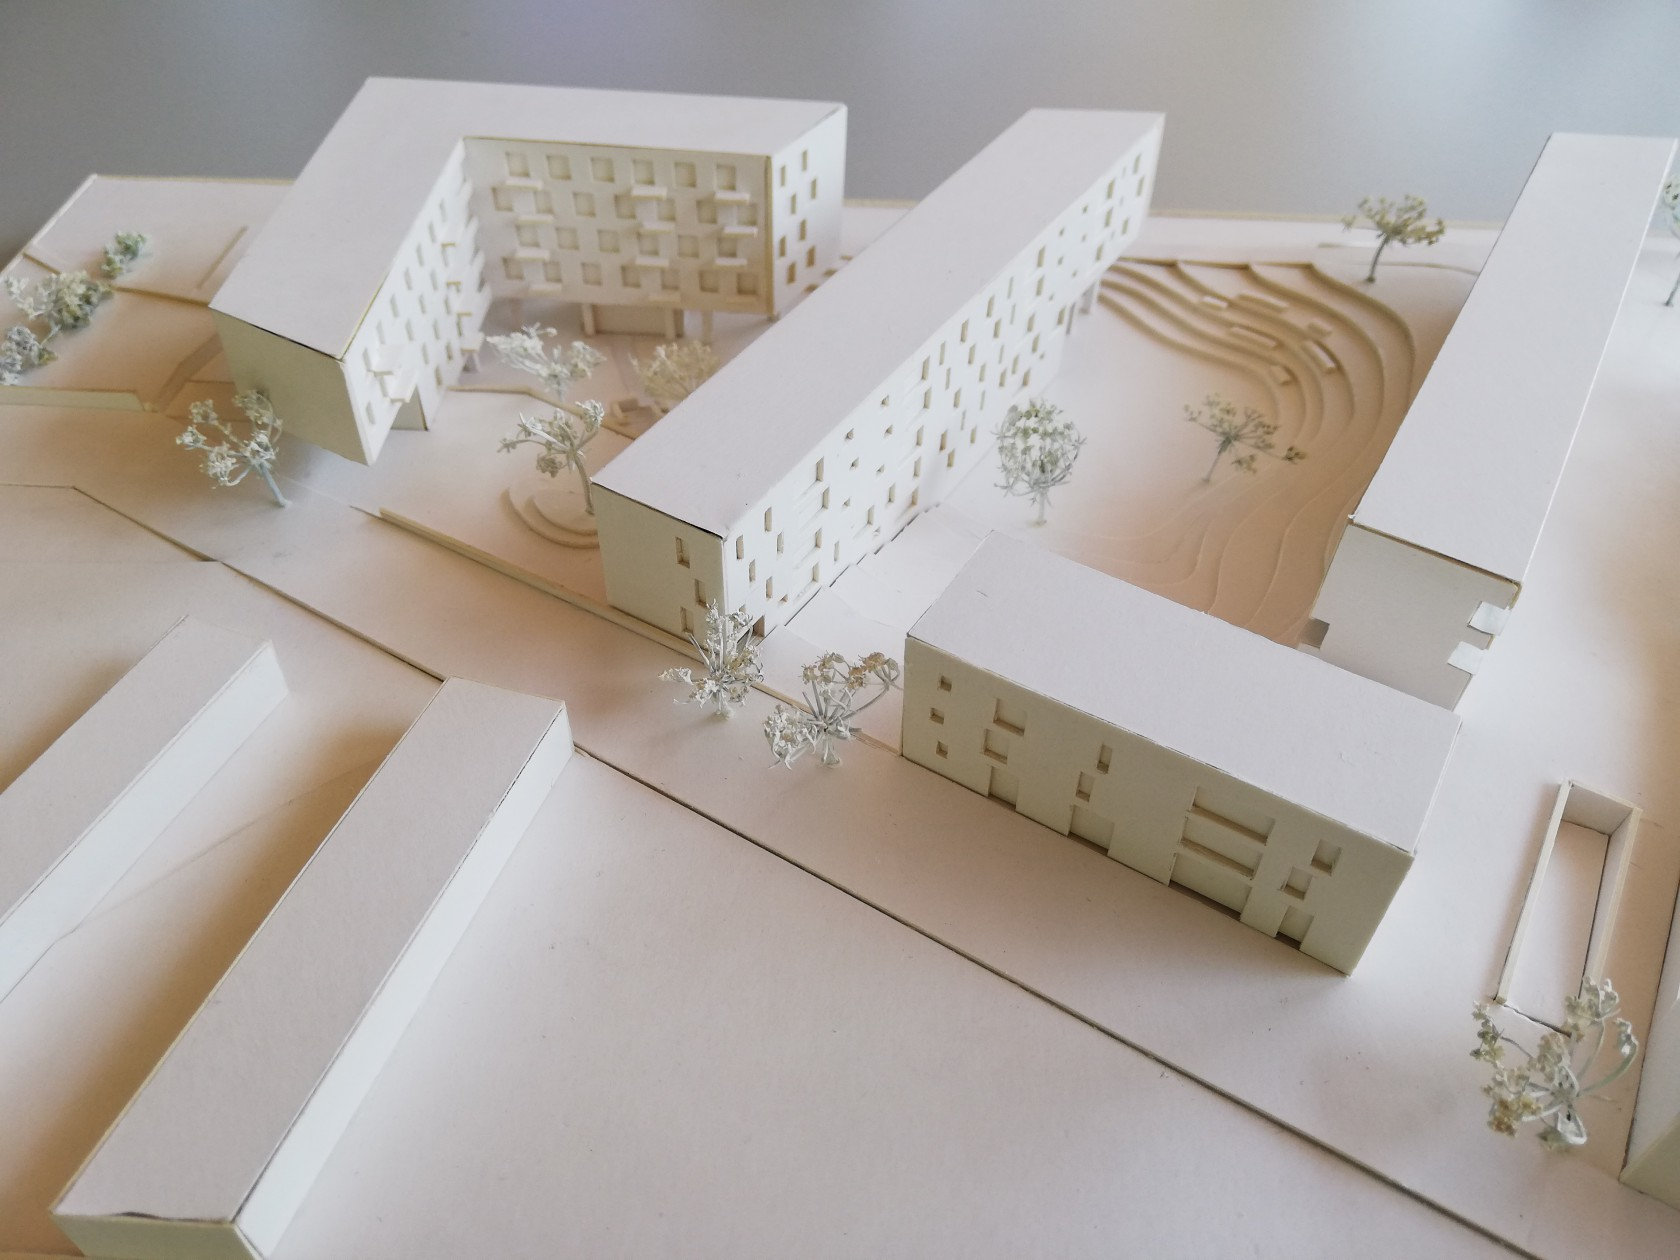 Abscis Architecten - maquette site Klein Rijsel